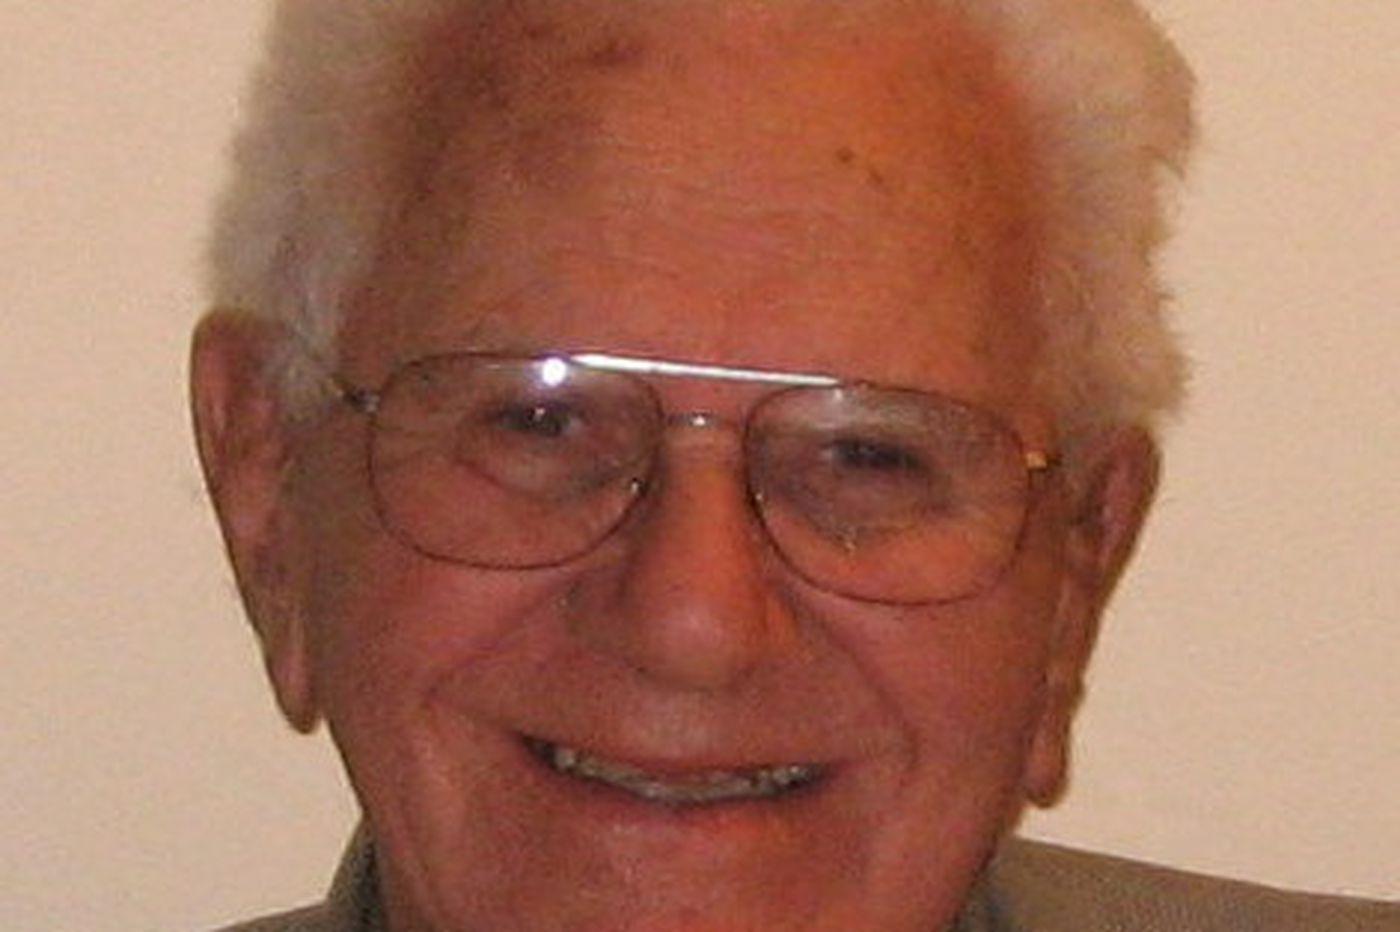 Robert M. Appelbaum, a businessman who founded a Quaker nonprofit center, dies at 98